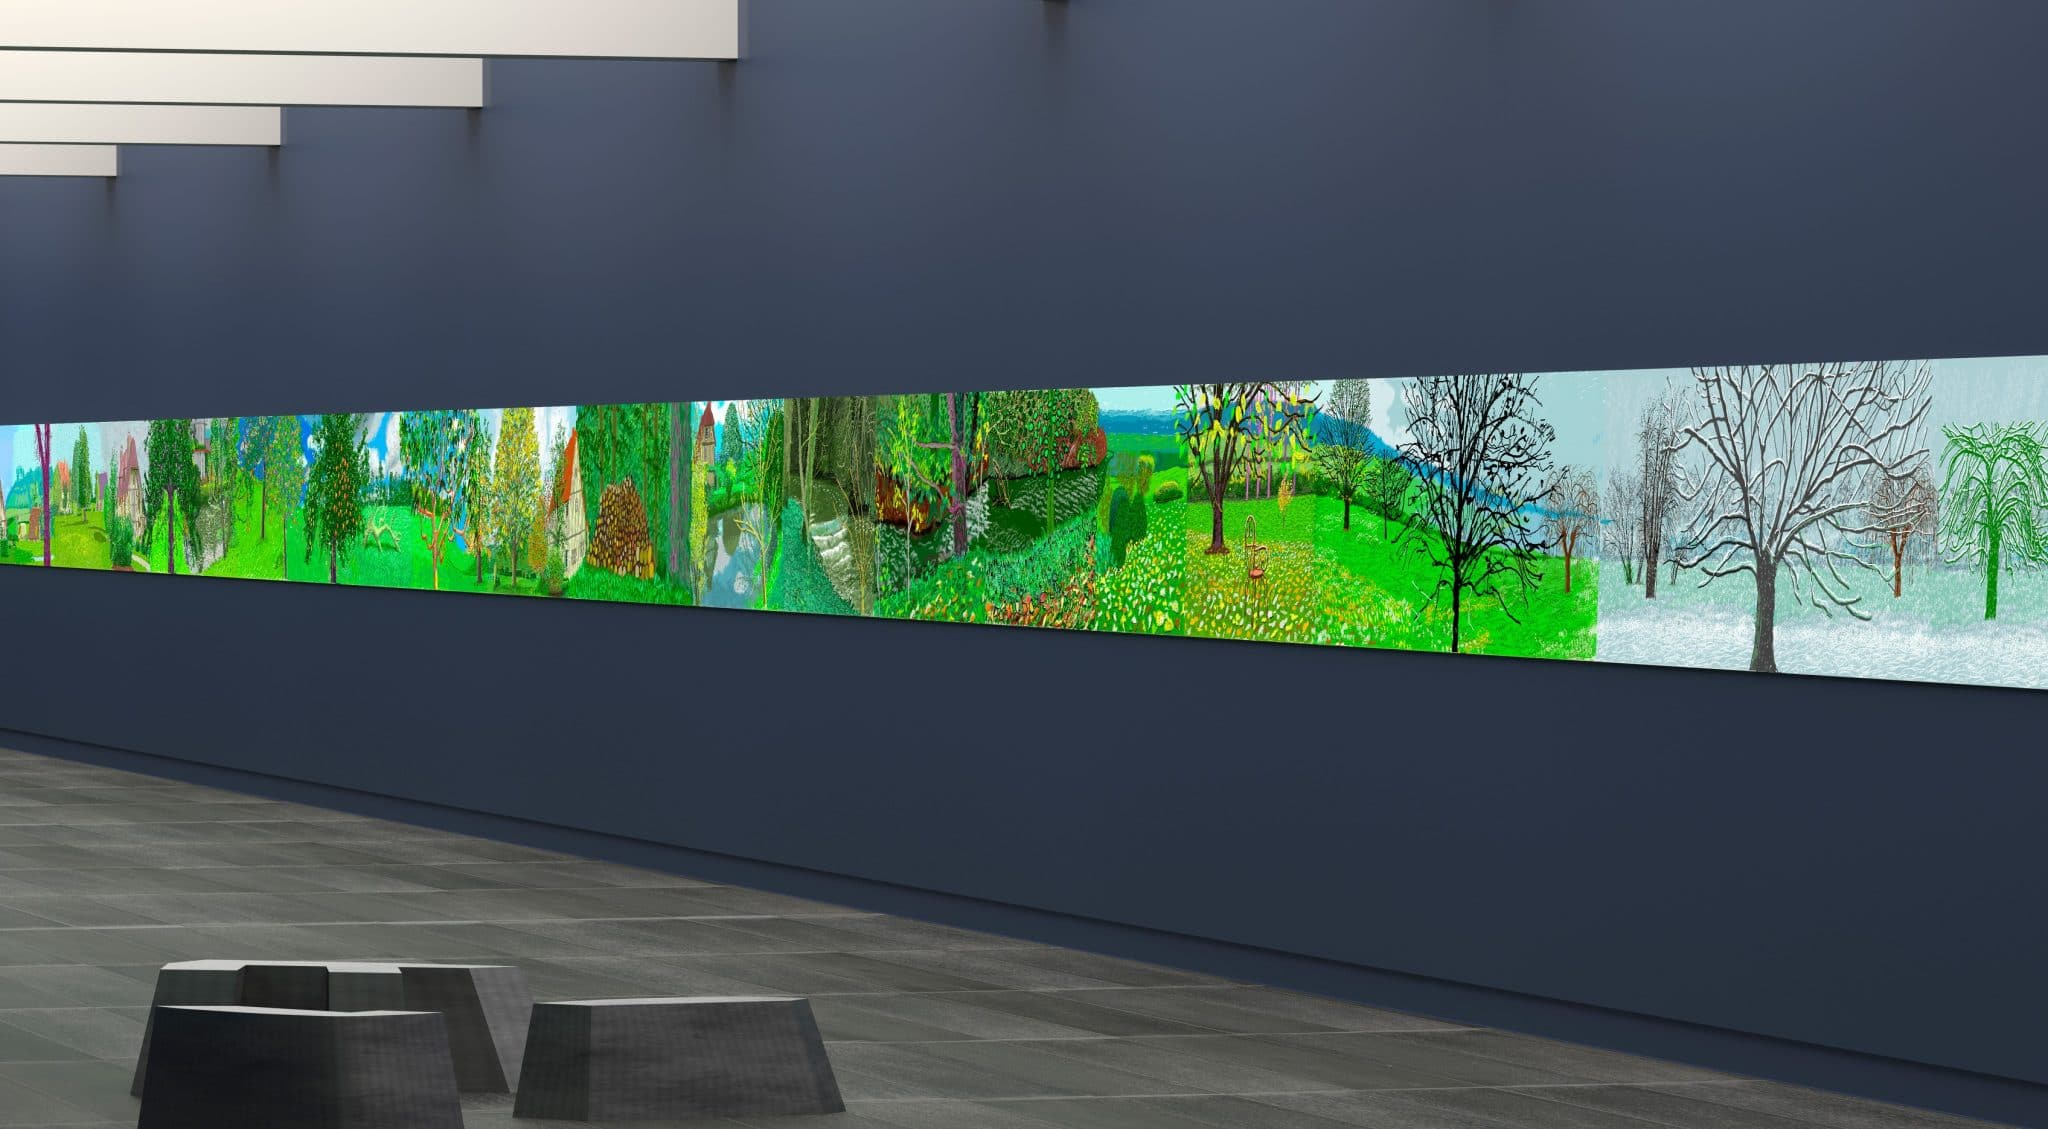 david hockney paris musée orangerie exposition normandie peinture